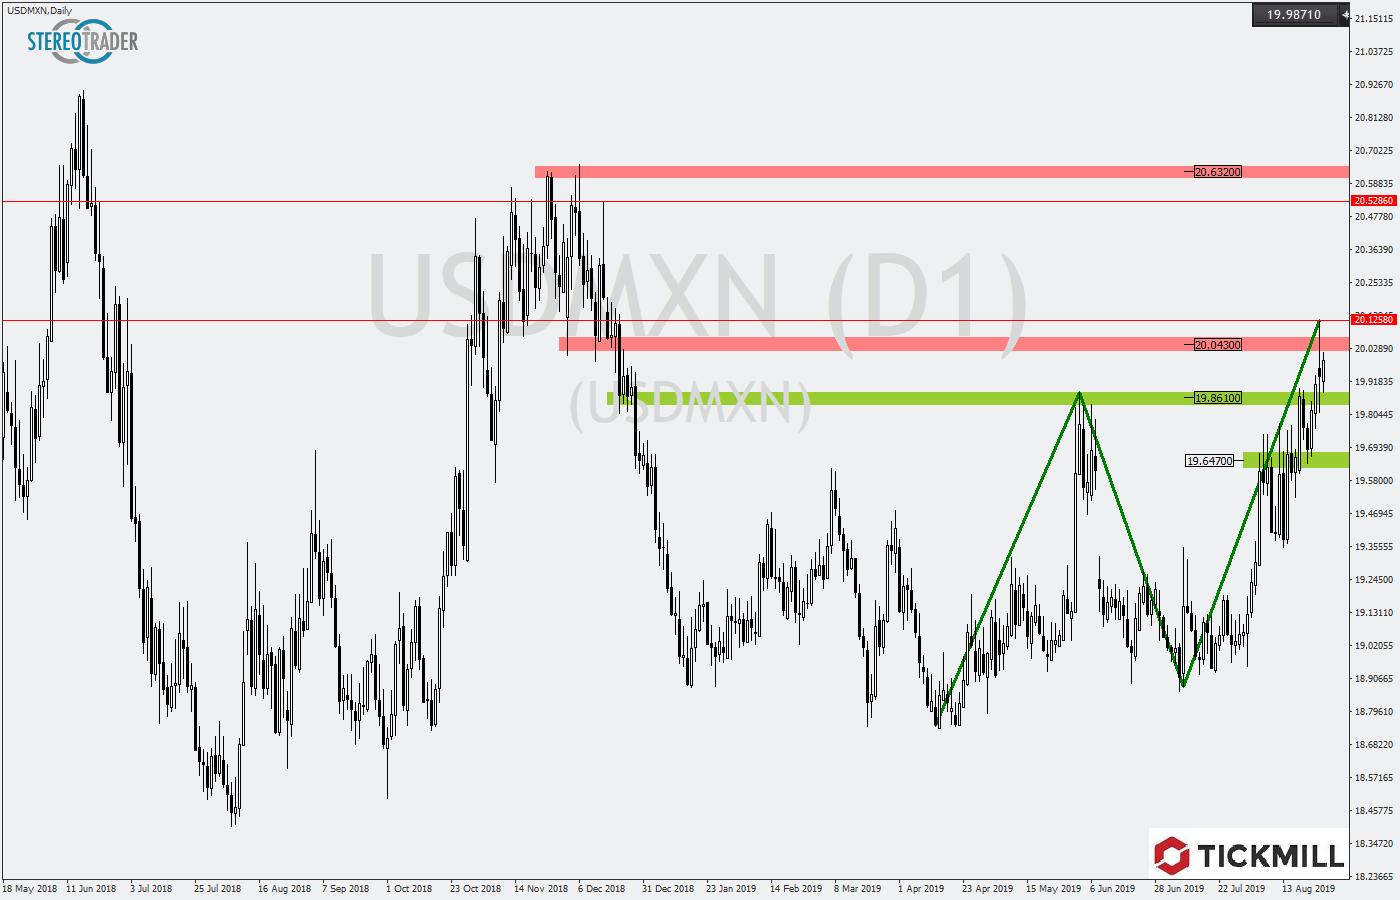 Tickmill-Analyse: USDMXN im Tageschart